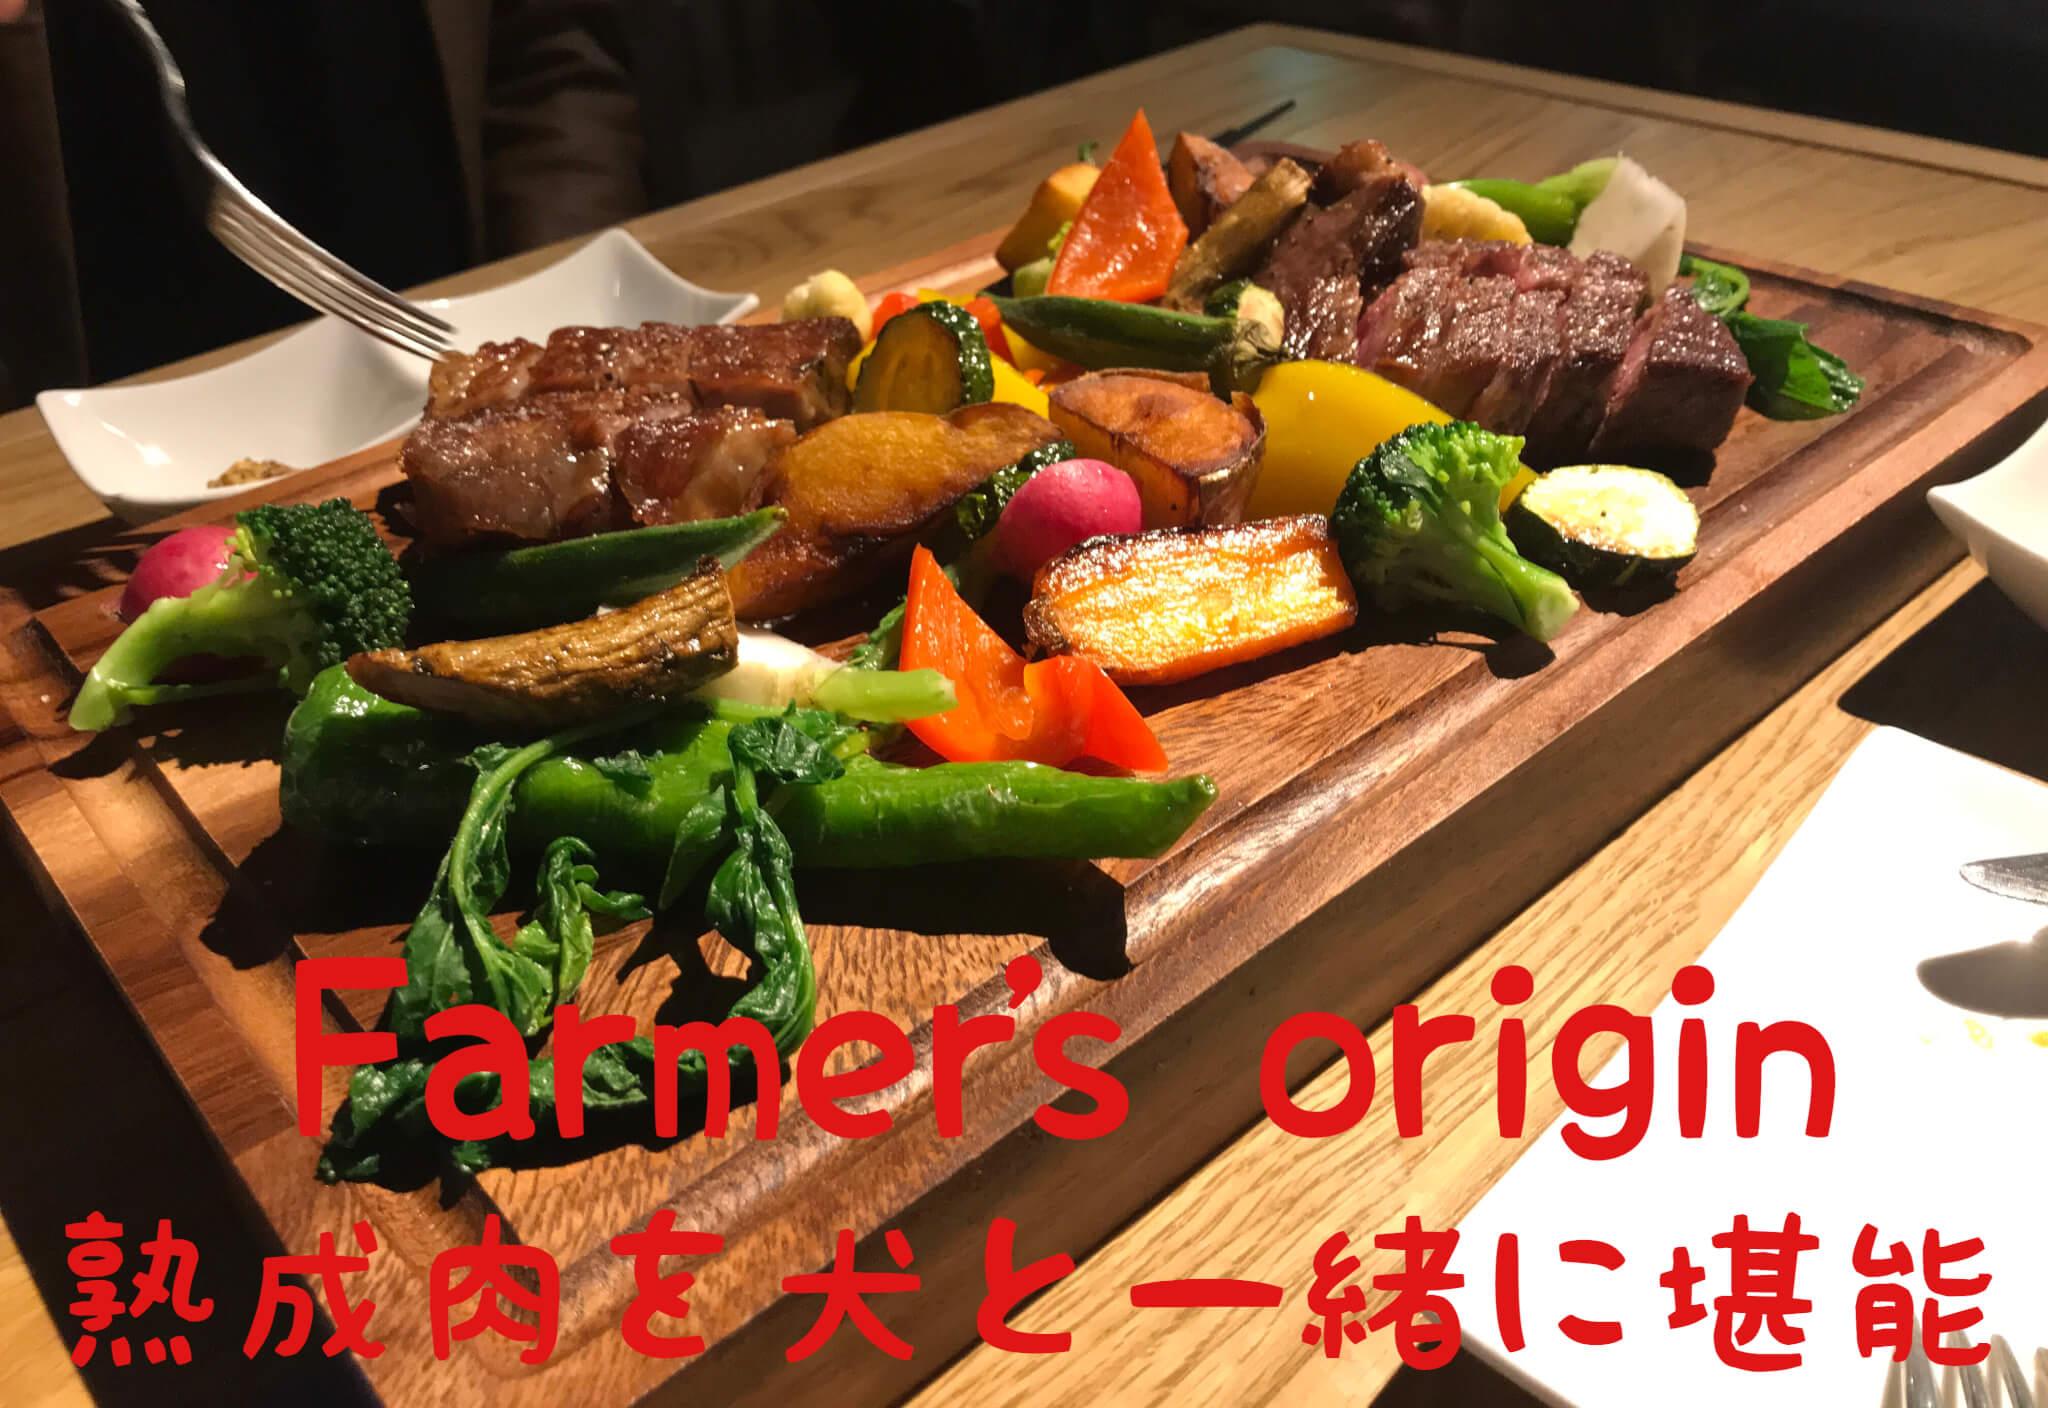 Farmer's origin 熟成肉を犬と一緒に堪能しよう 熟成肉と野菜